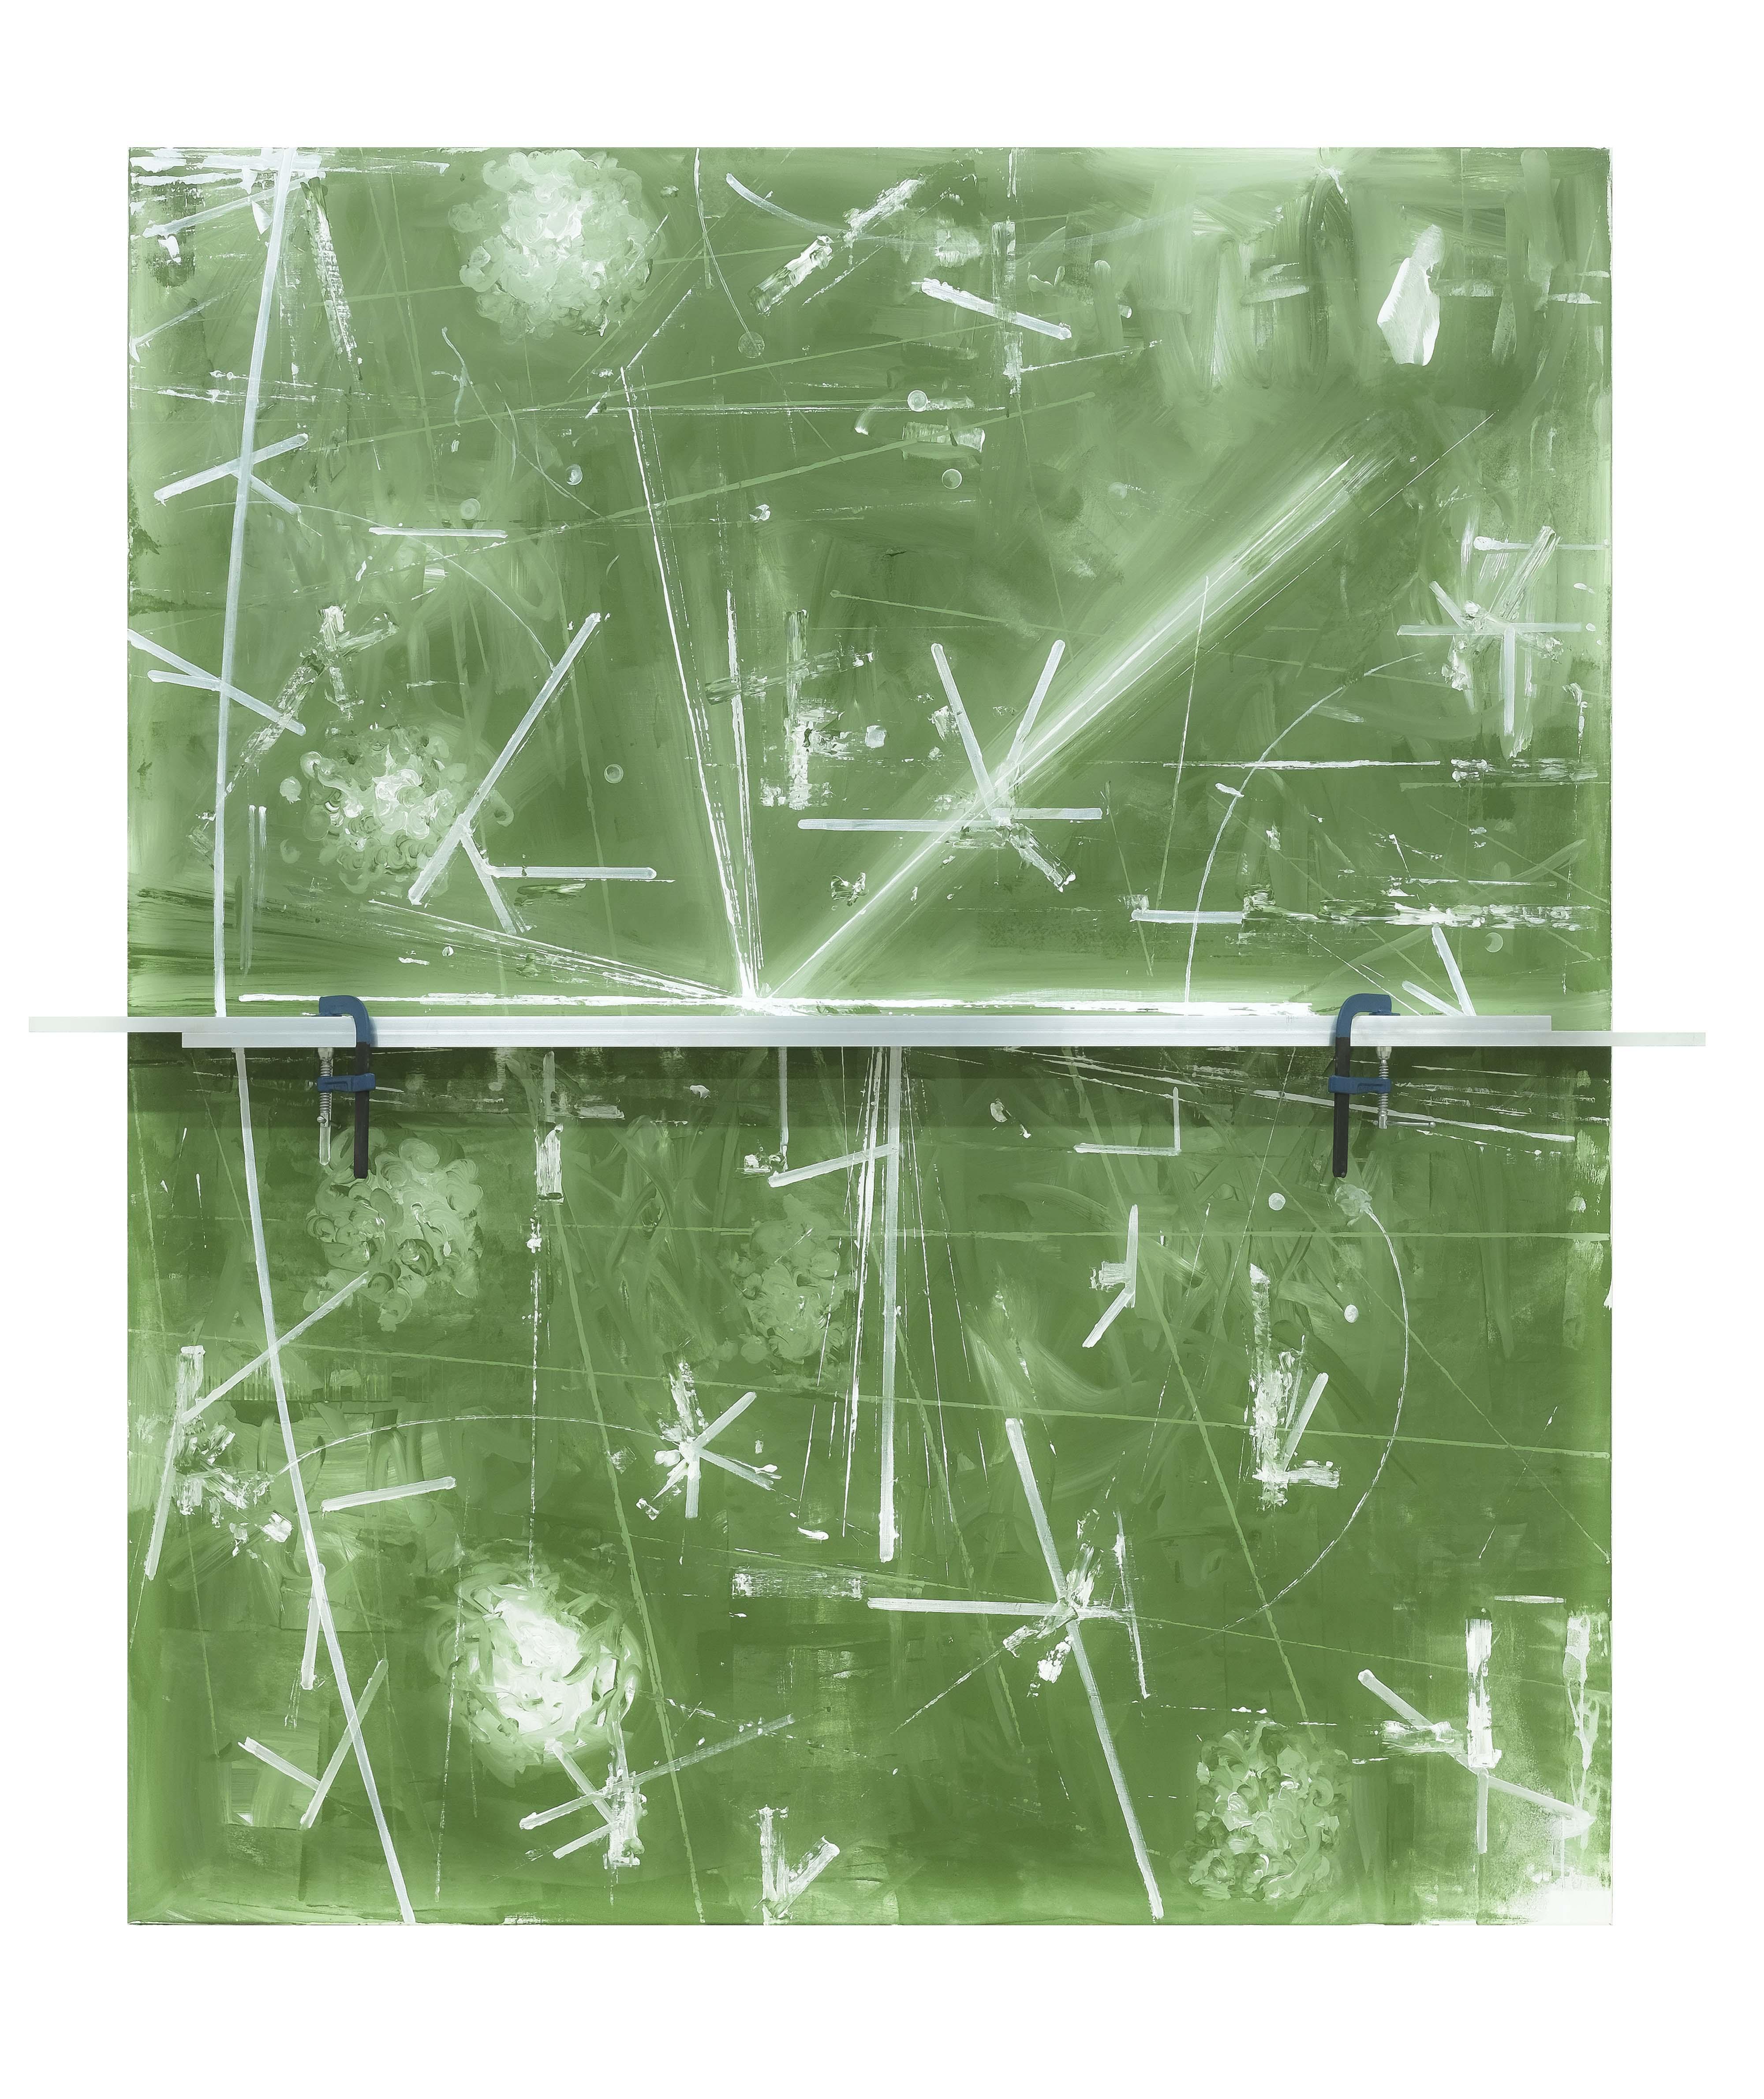 Untitled, 2016, acrylic on canvas, aluminum profile, screw clamps, 240 x 220 x 16,5 cm